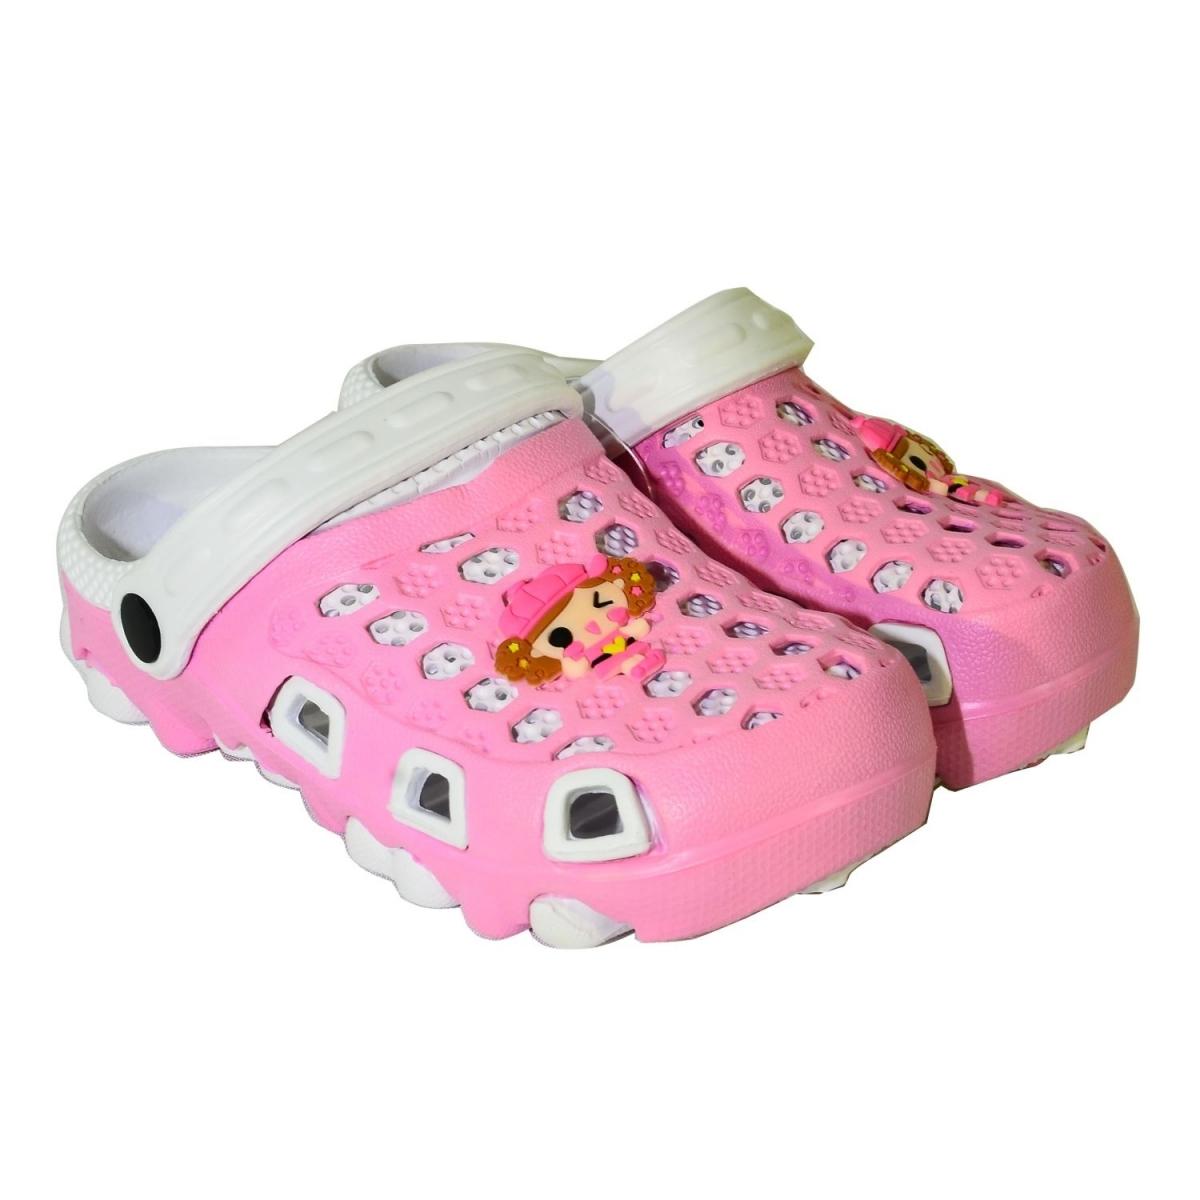 d1d62f17a73f Detské bielo-ružové gumené papuče DANICA